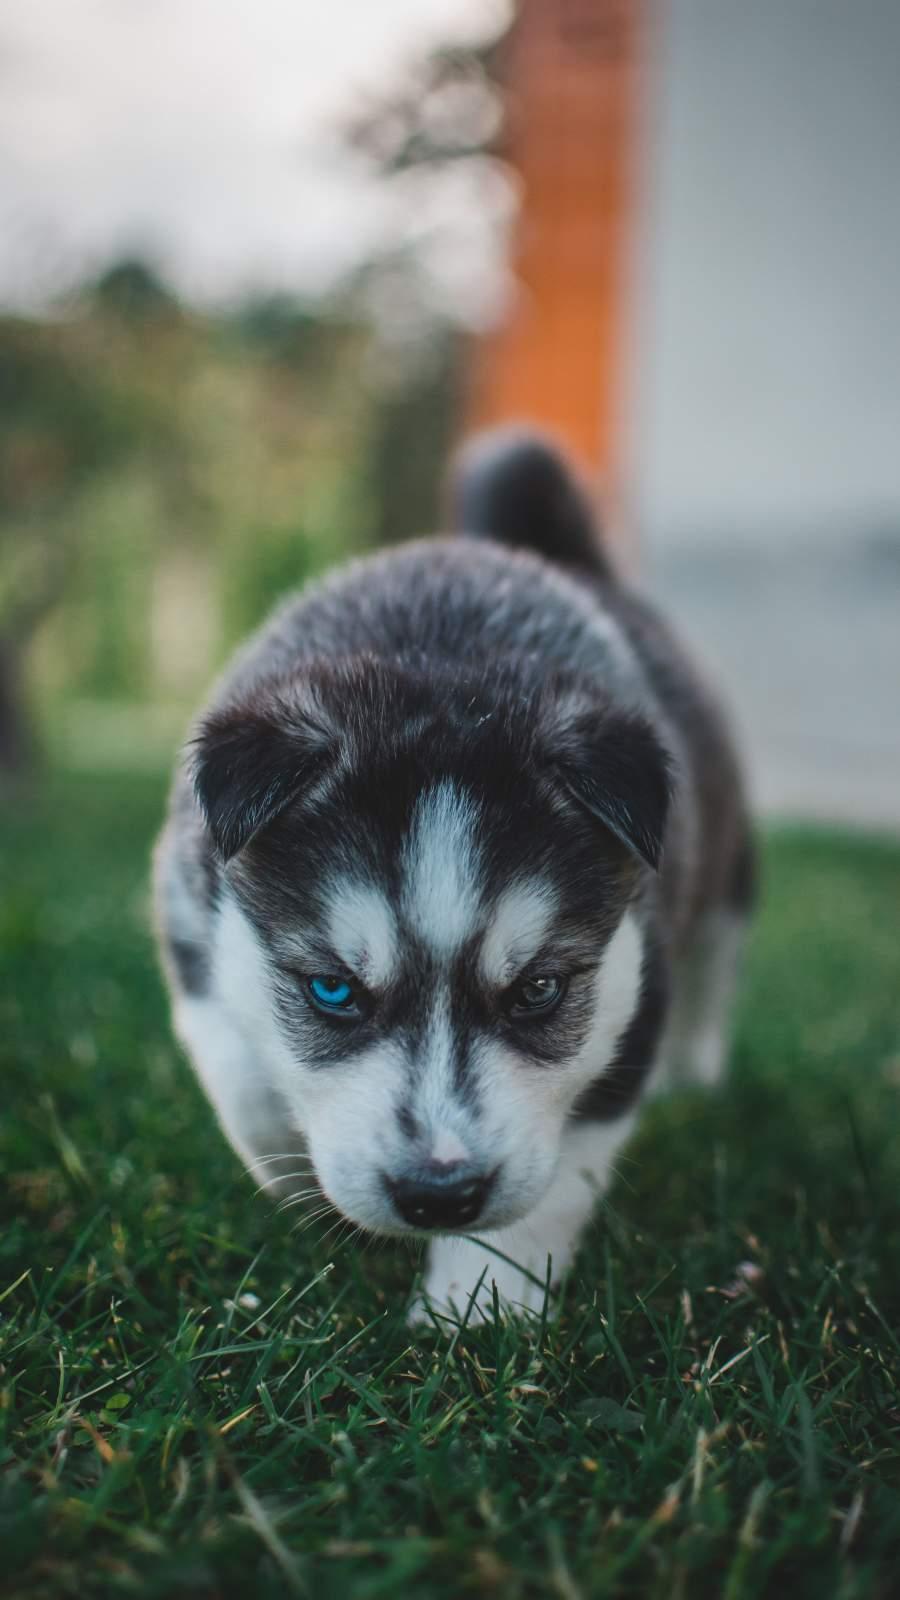 Husky Puppy iPhone Wallpaper